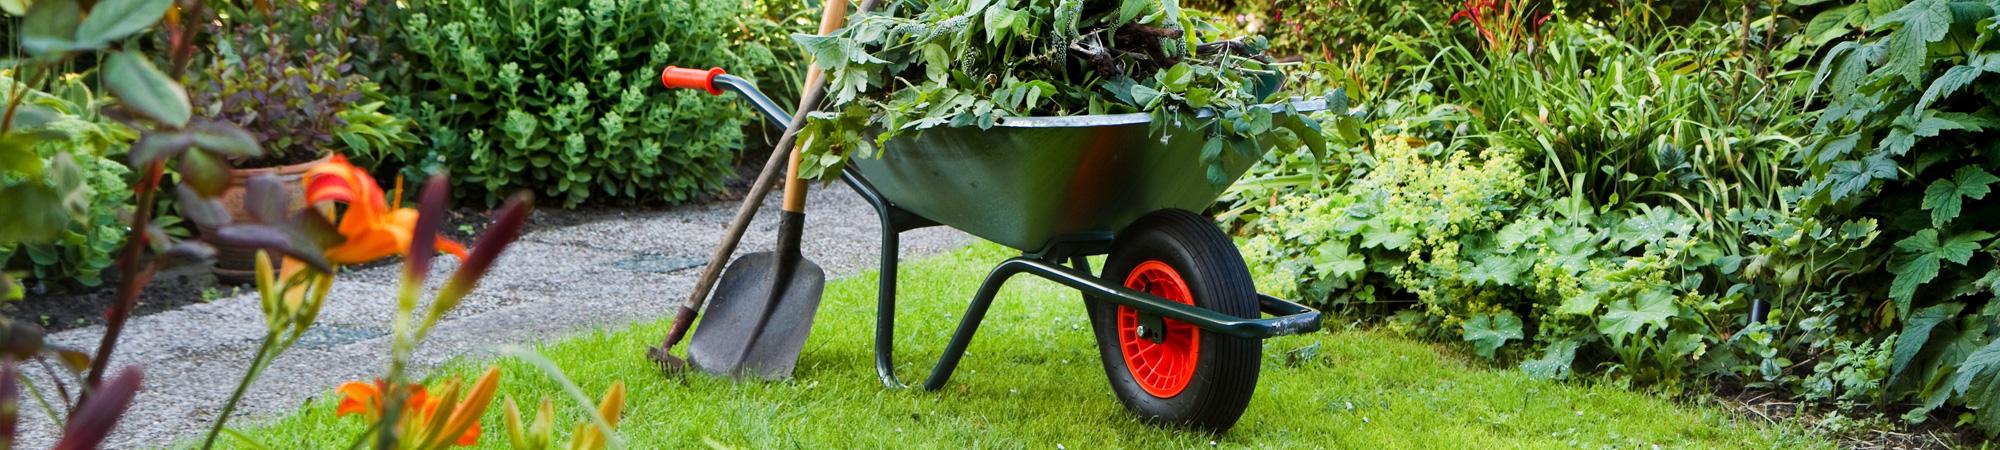 jardineriaslider